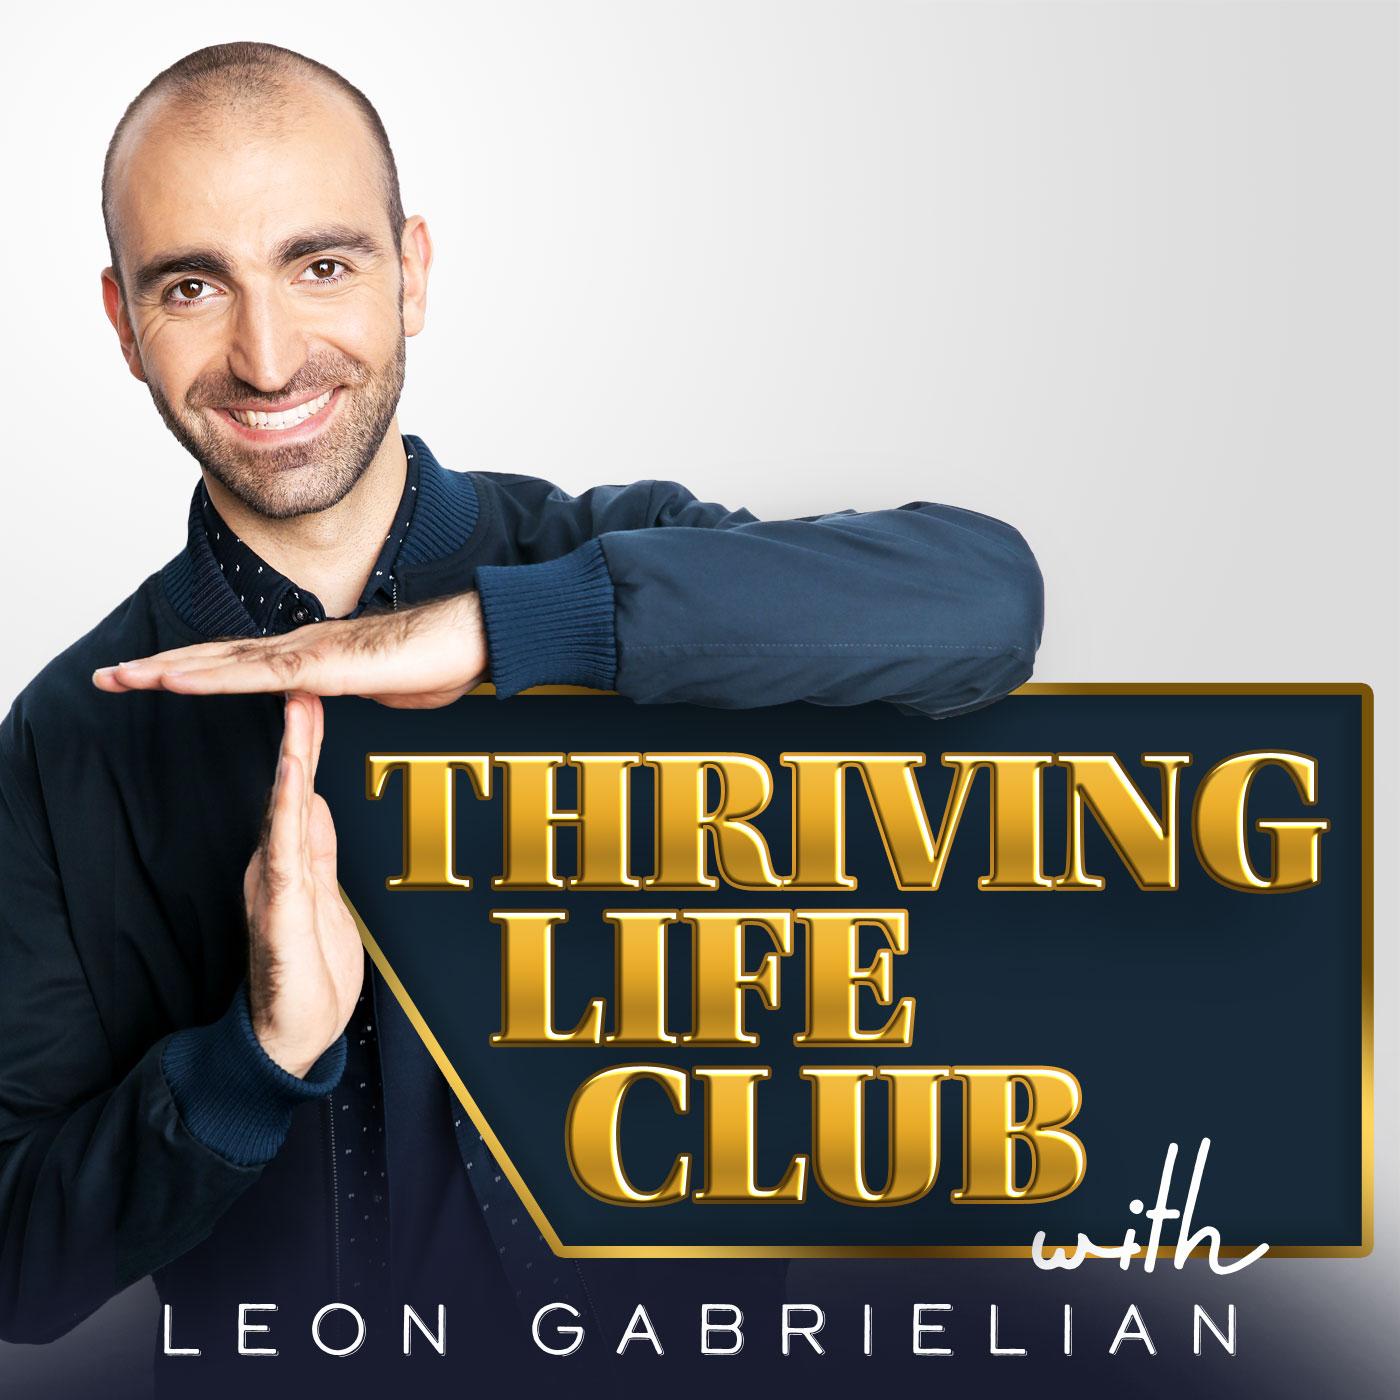 Thriving Life Club with Leon Gabrielian